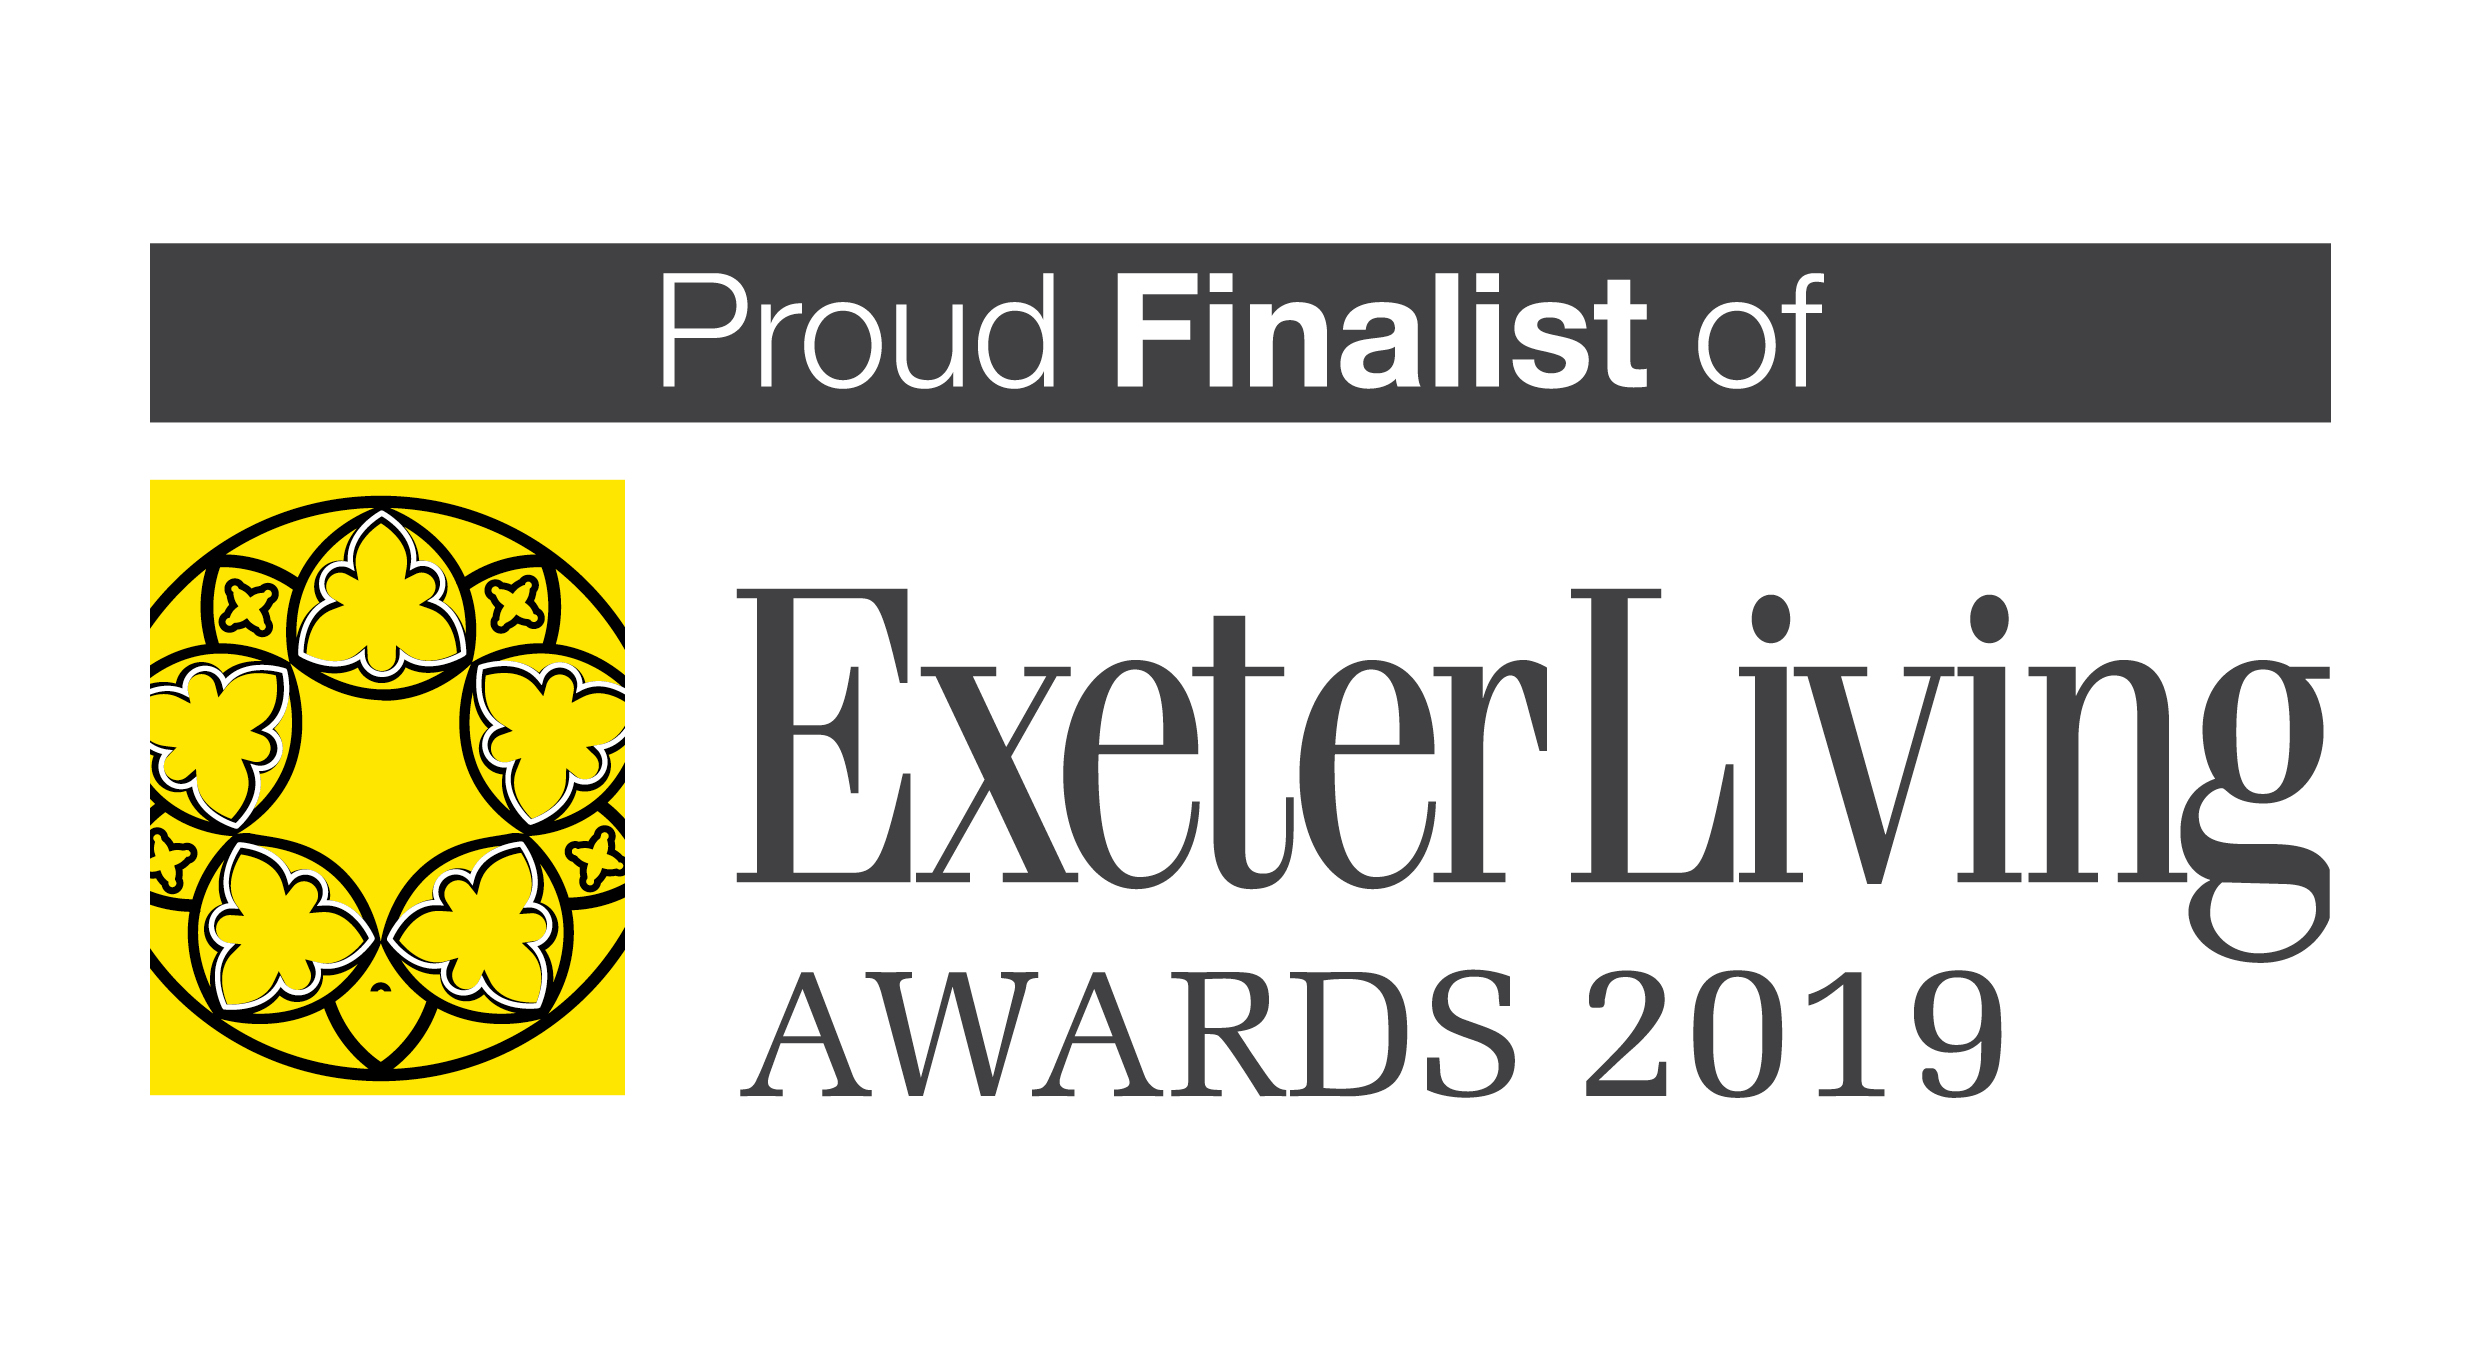 Exeter Living Awards 2019 Finalist